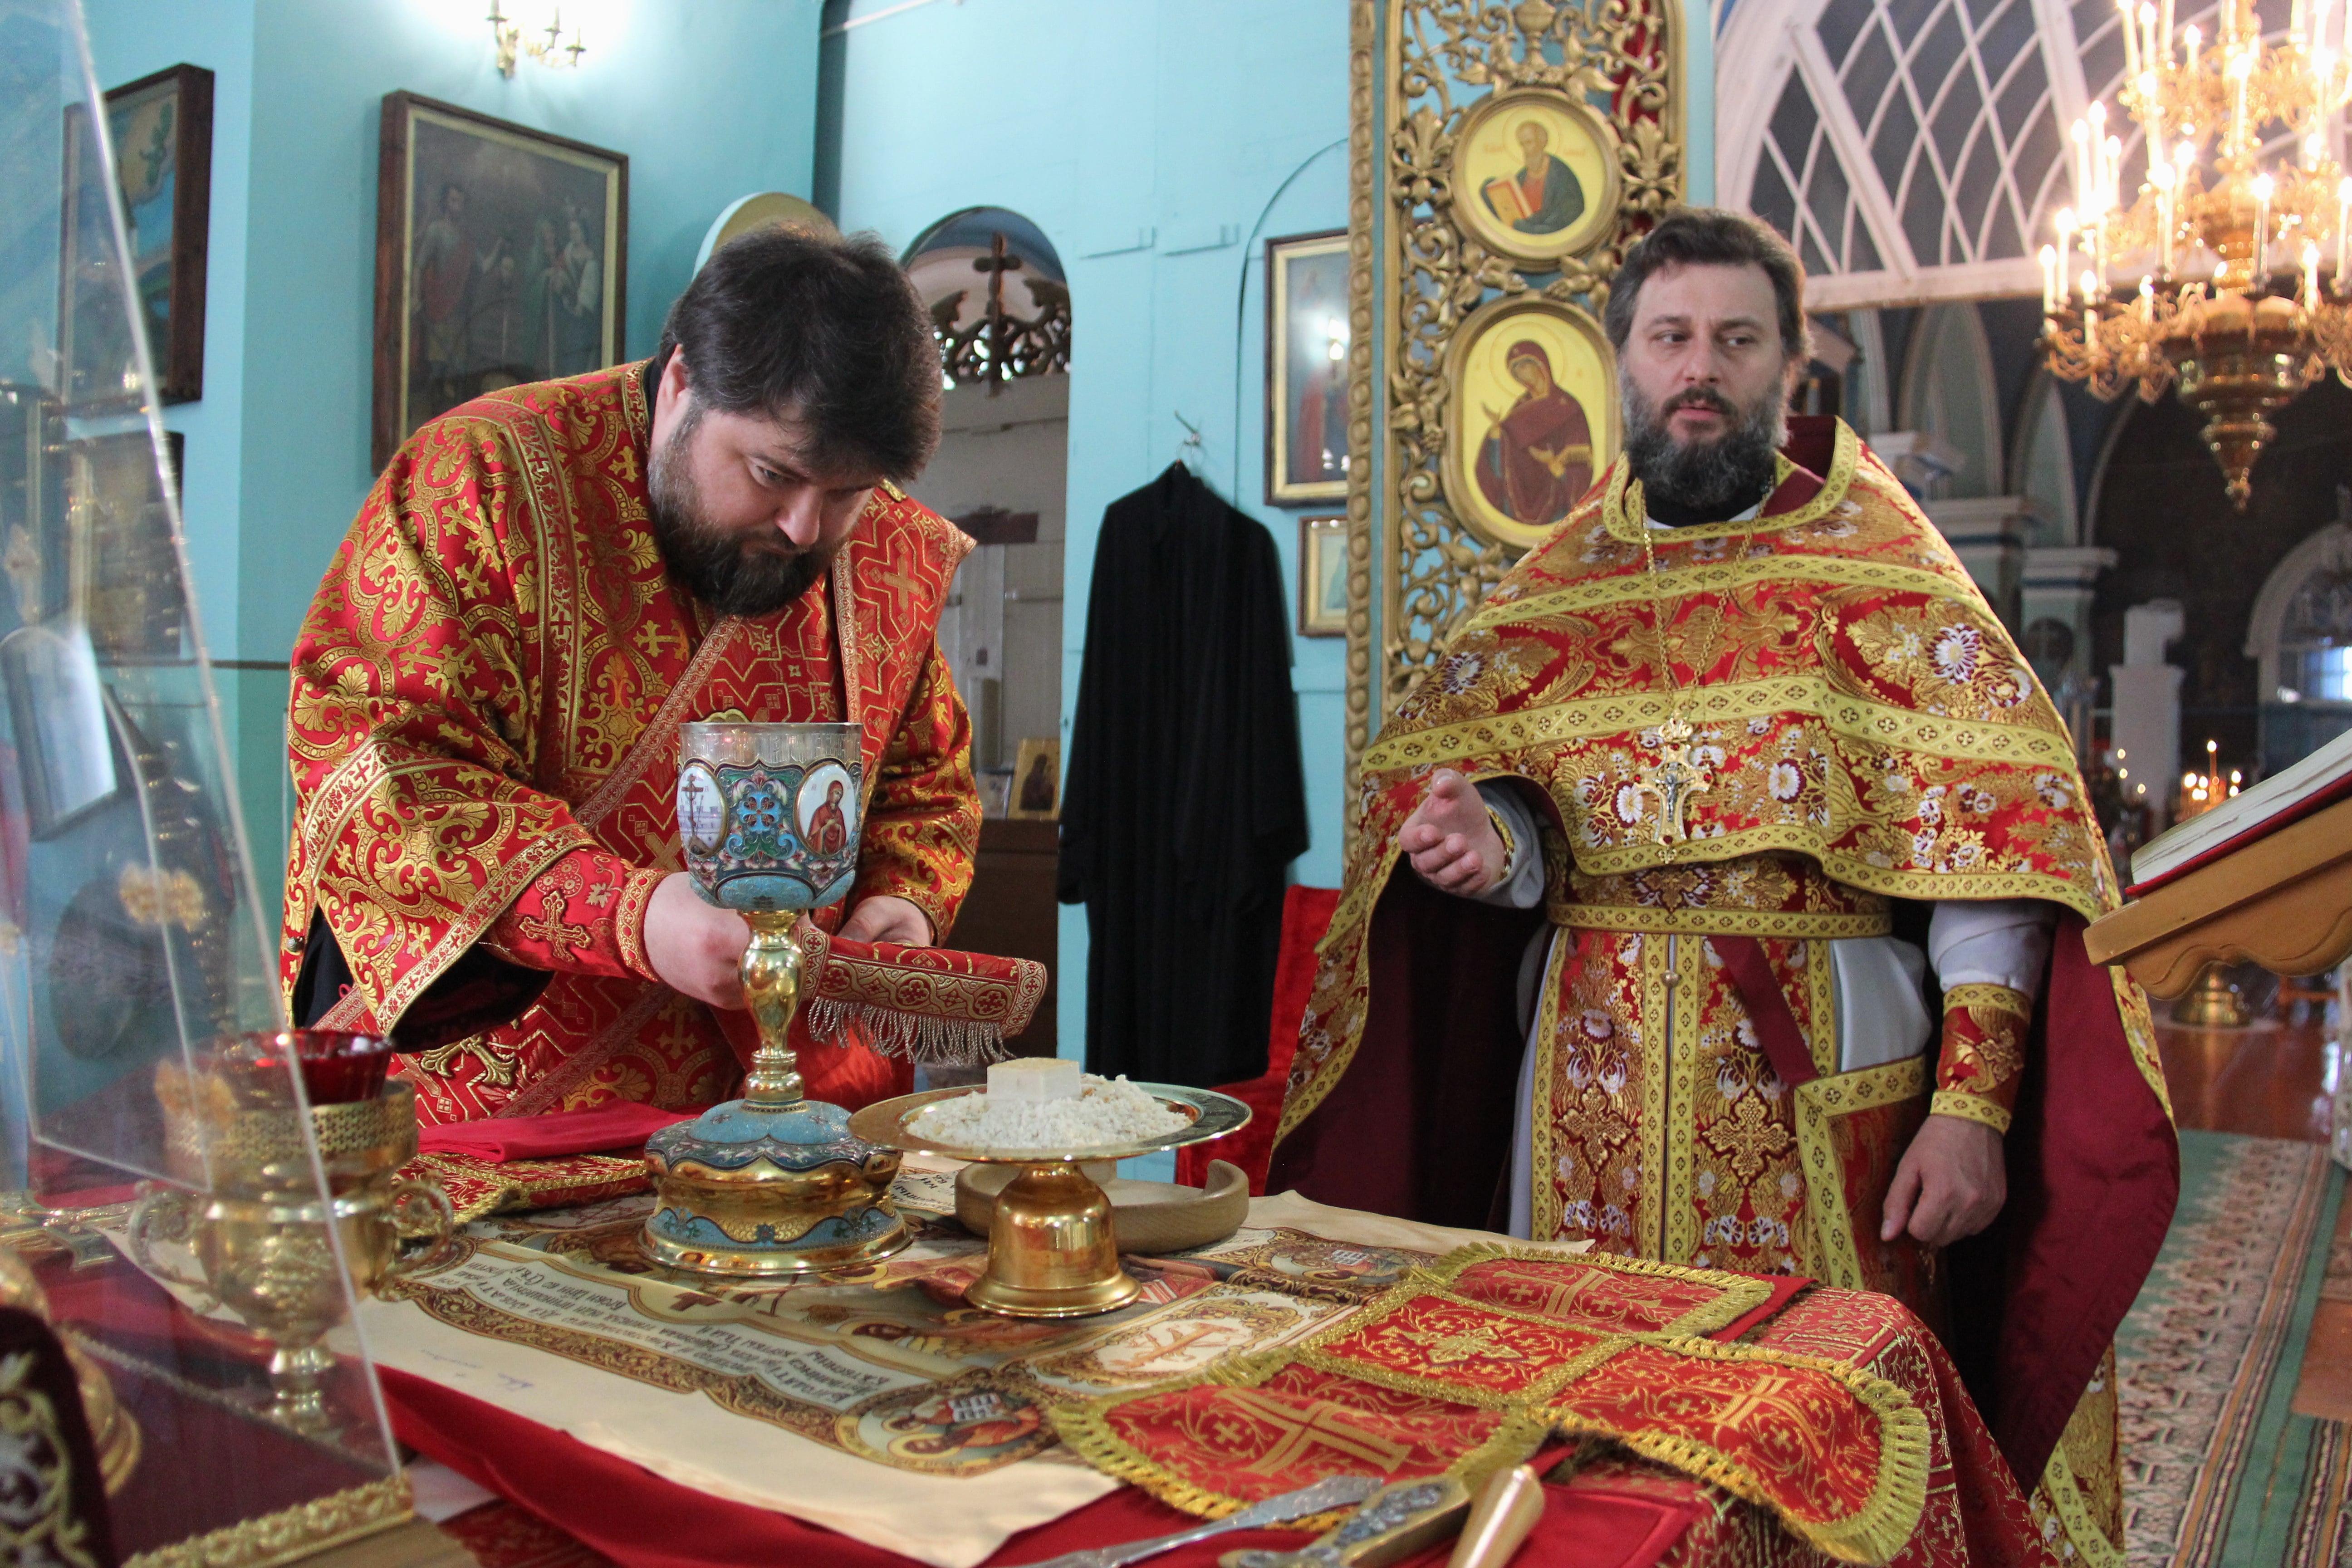 http://monuspen.ru/photoreports/761cedcebac14ed511129cb83b587d57.JPG